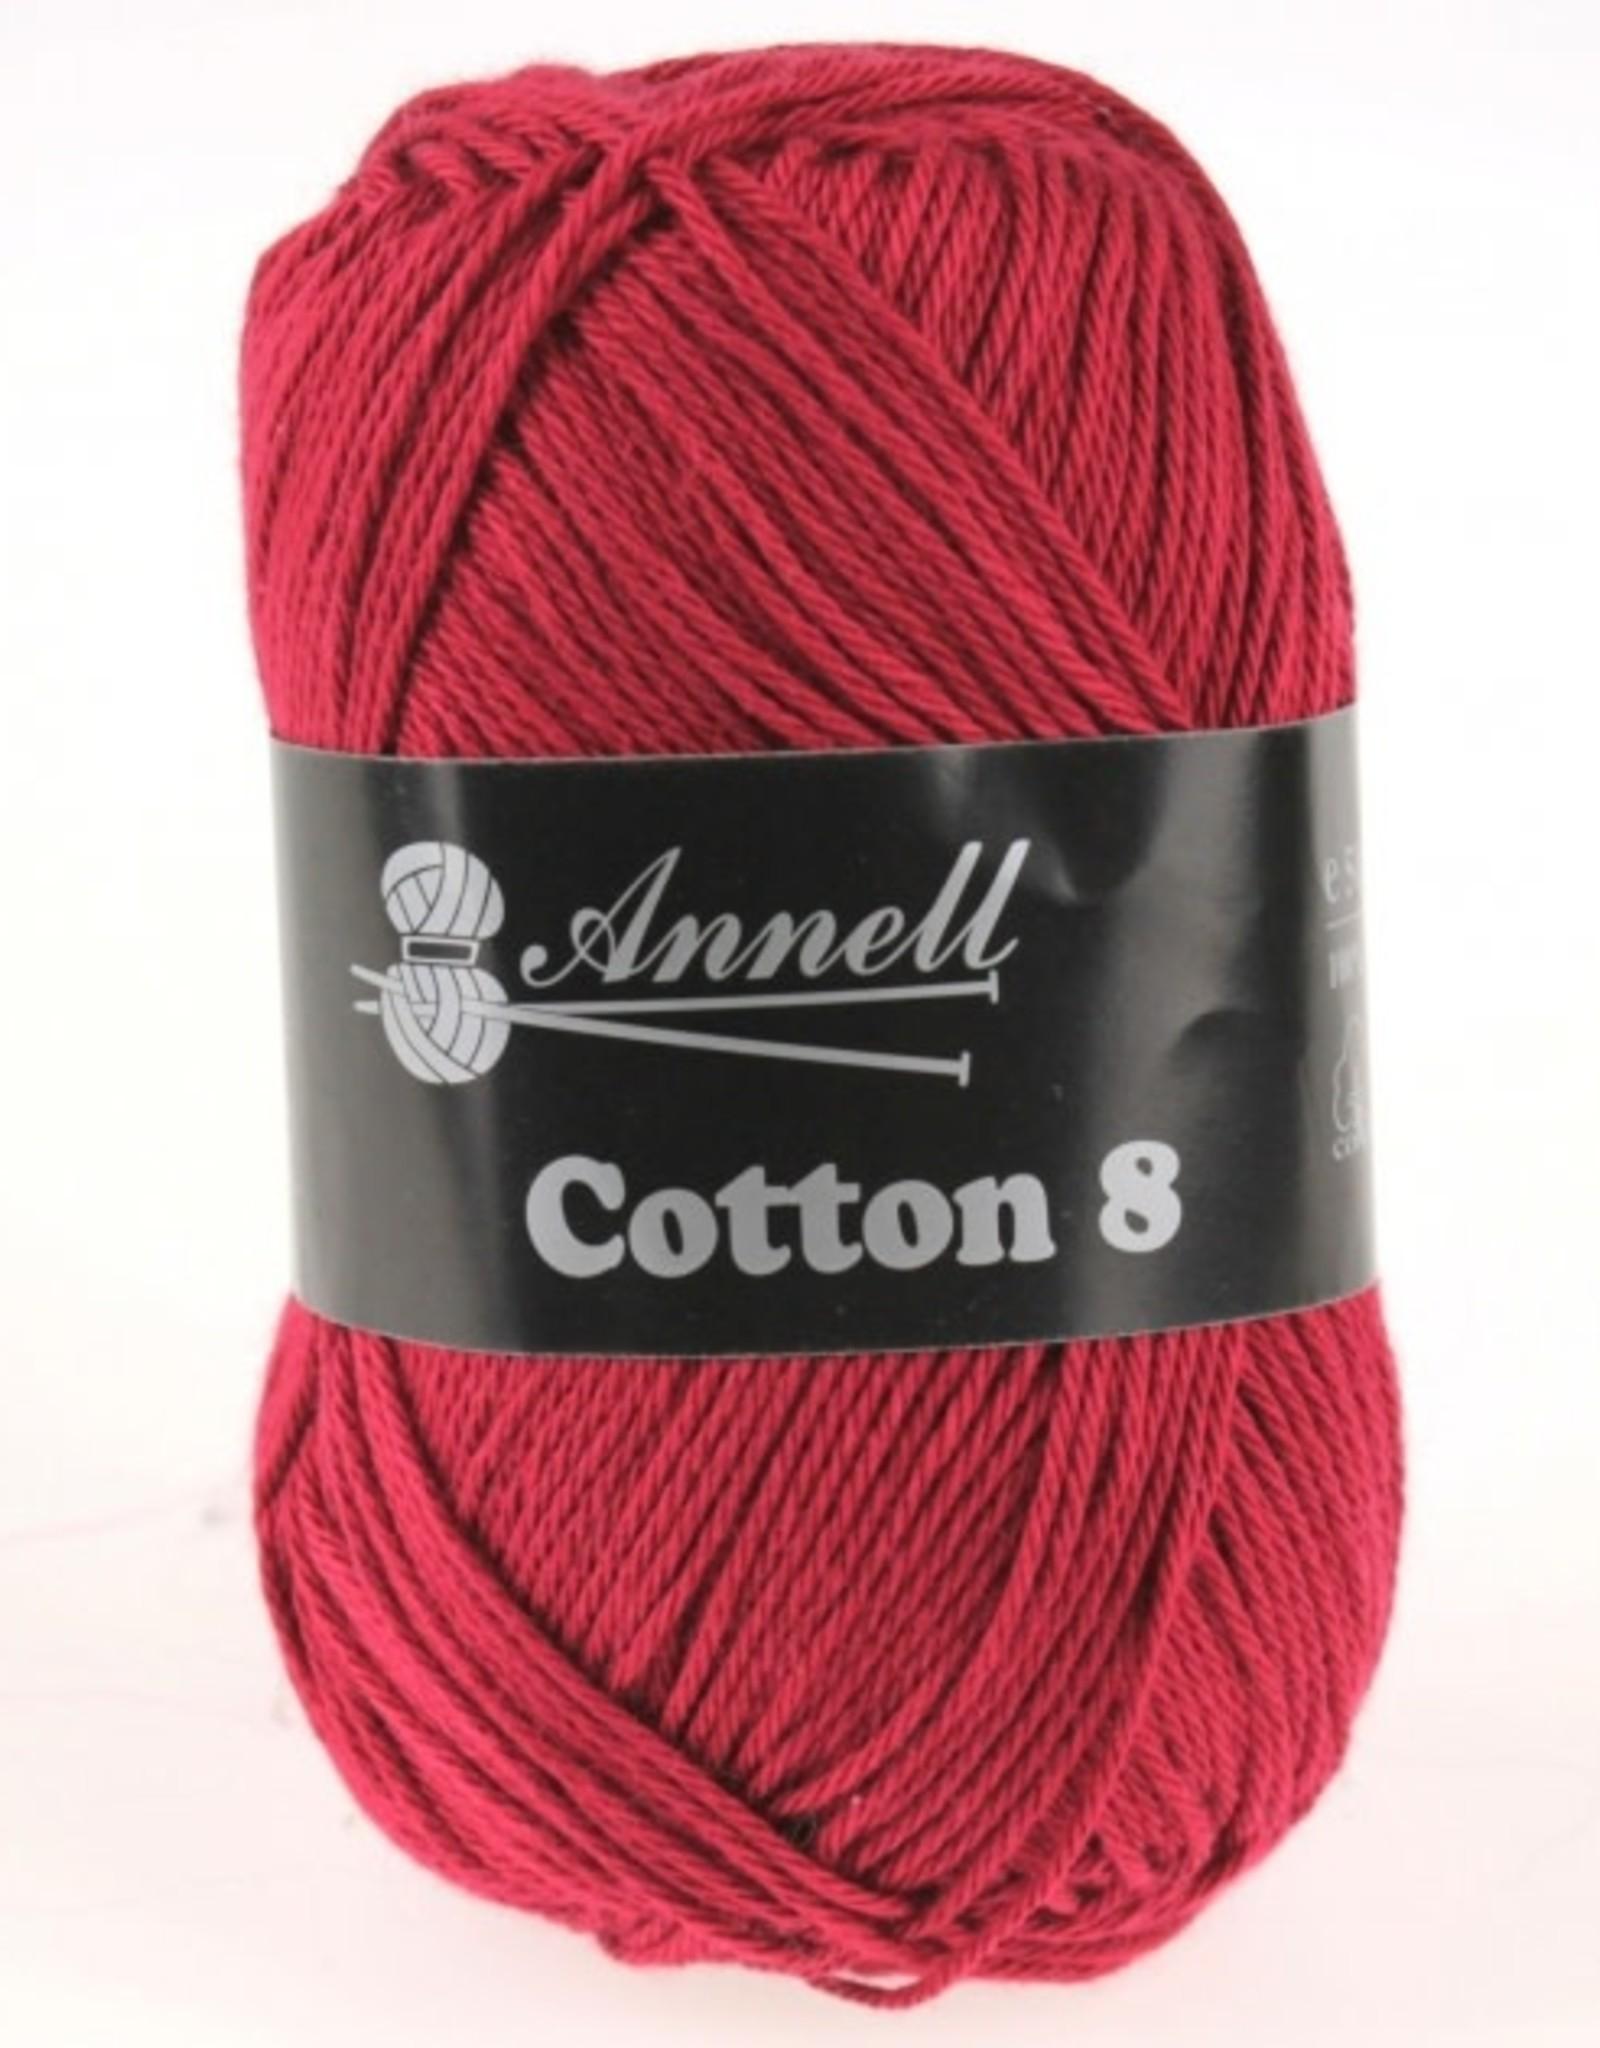 Annell Annell Cotton 8 10